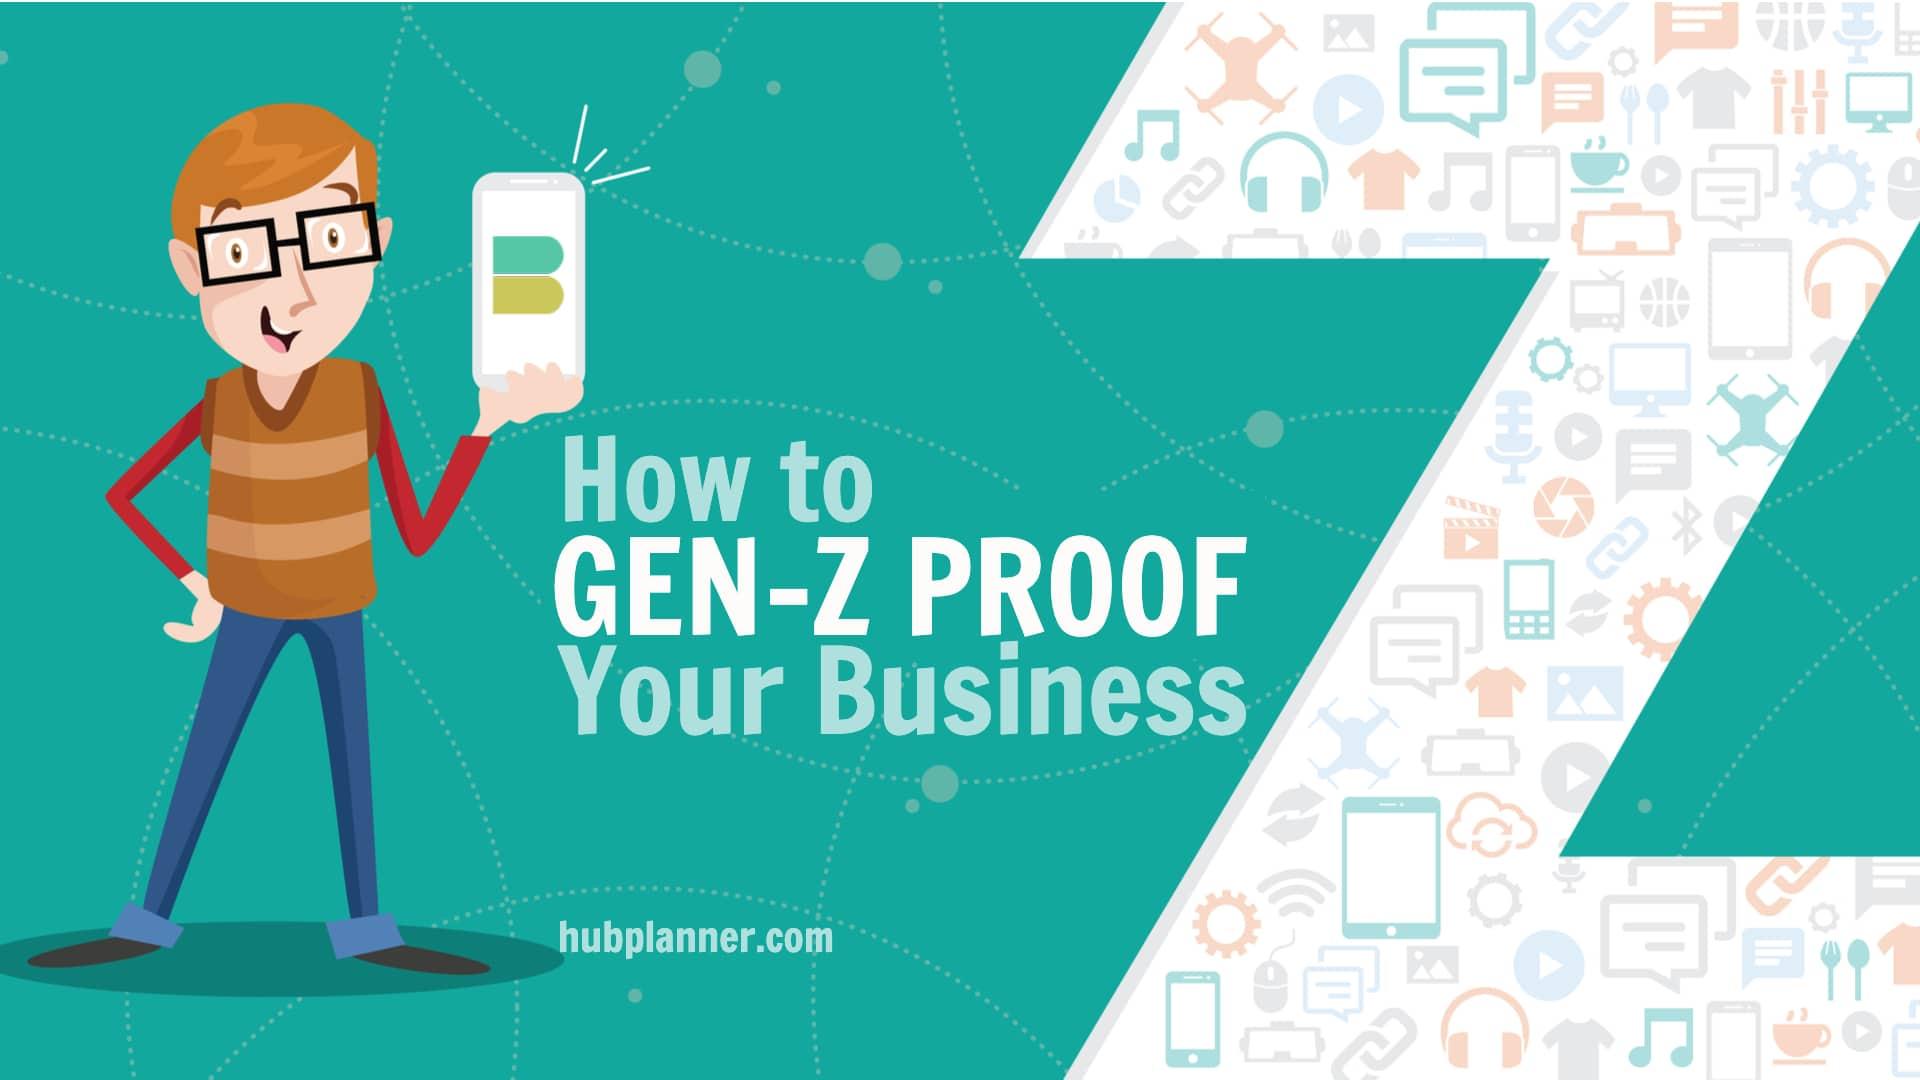 Gen-Z Proof Your Business